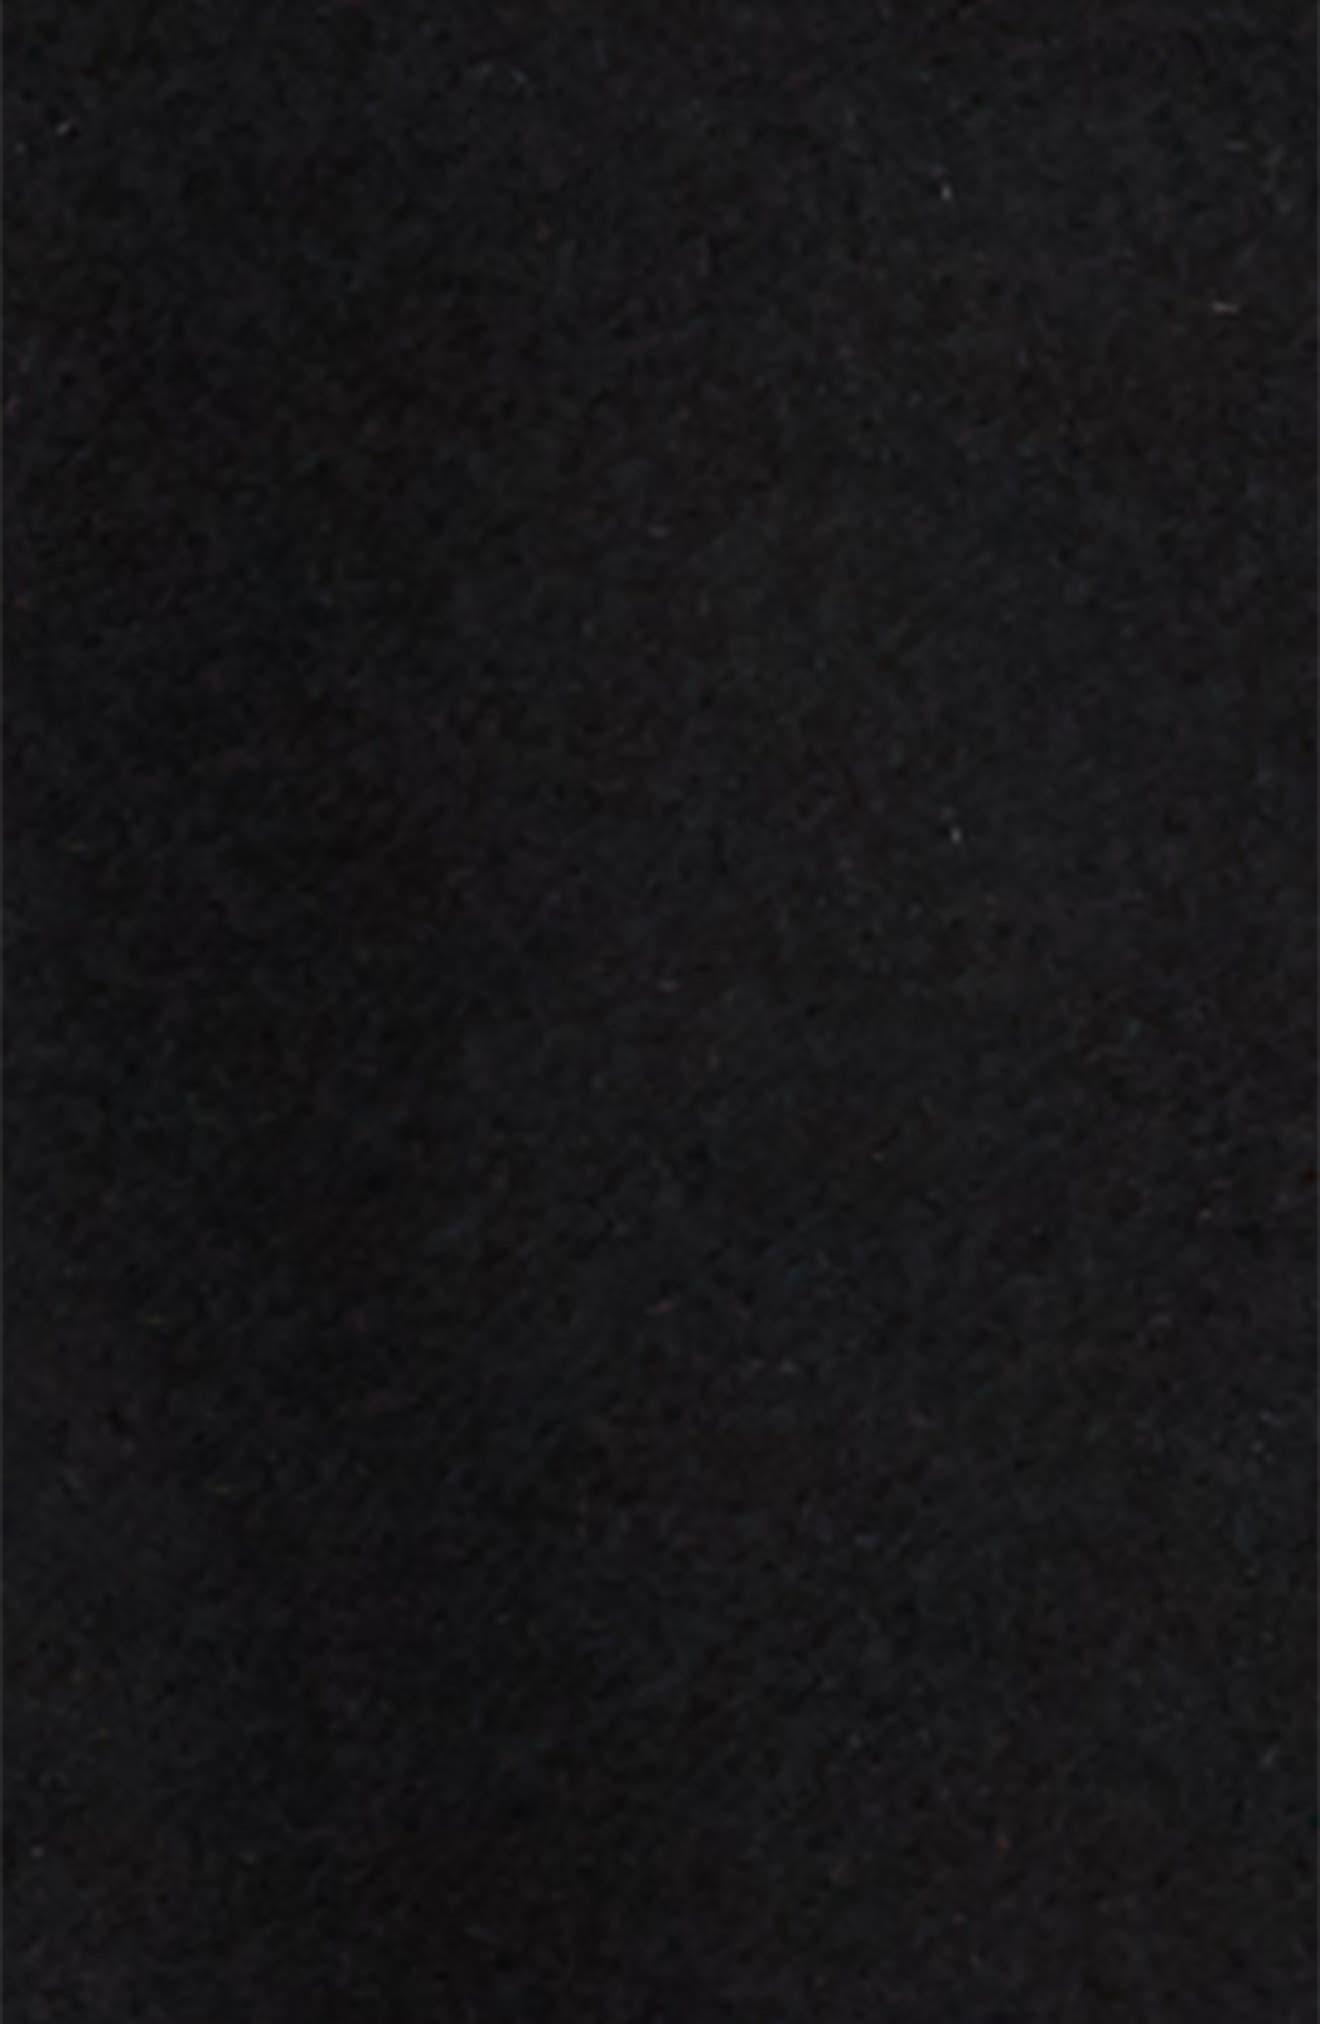 BURBERRY, Burford Double-Face Wool Duffel Coat, Alternate thumbnail 2, color, 001